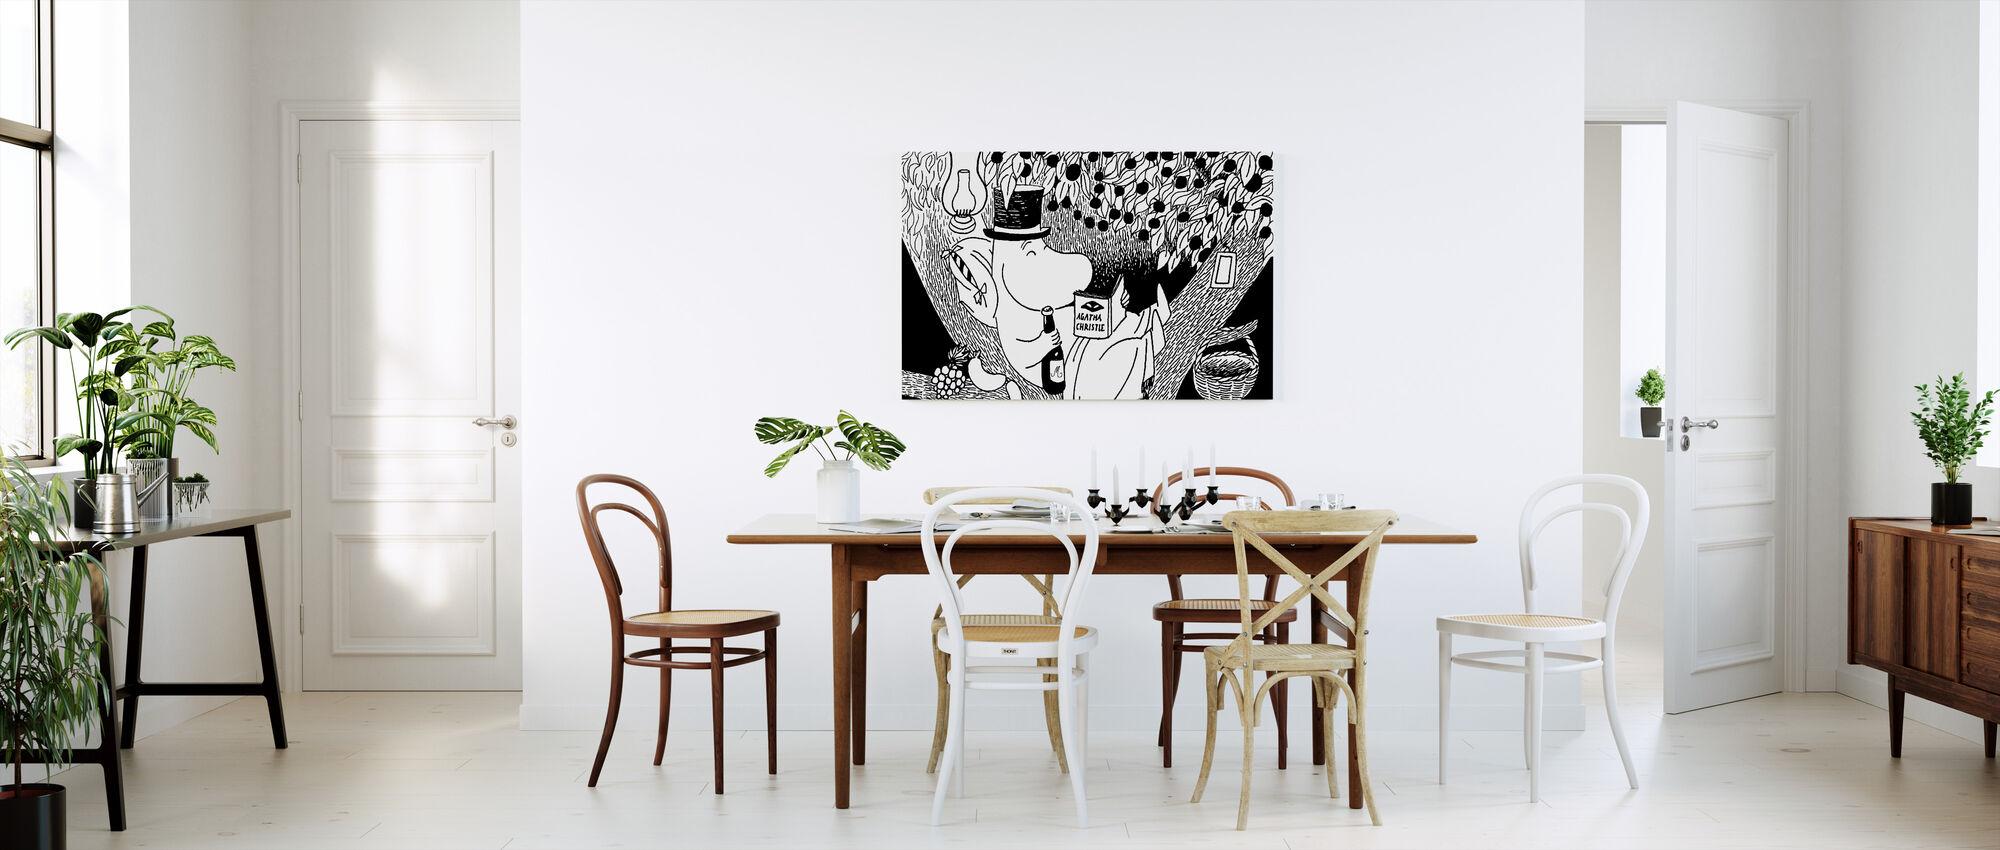 Moomin - Moominpappa Reading in a Tree - Canvas print - Kitchen